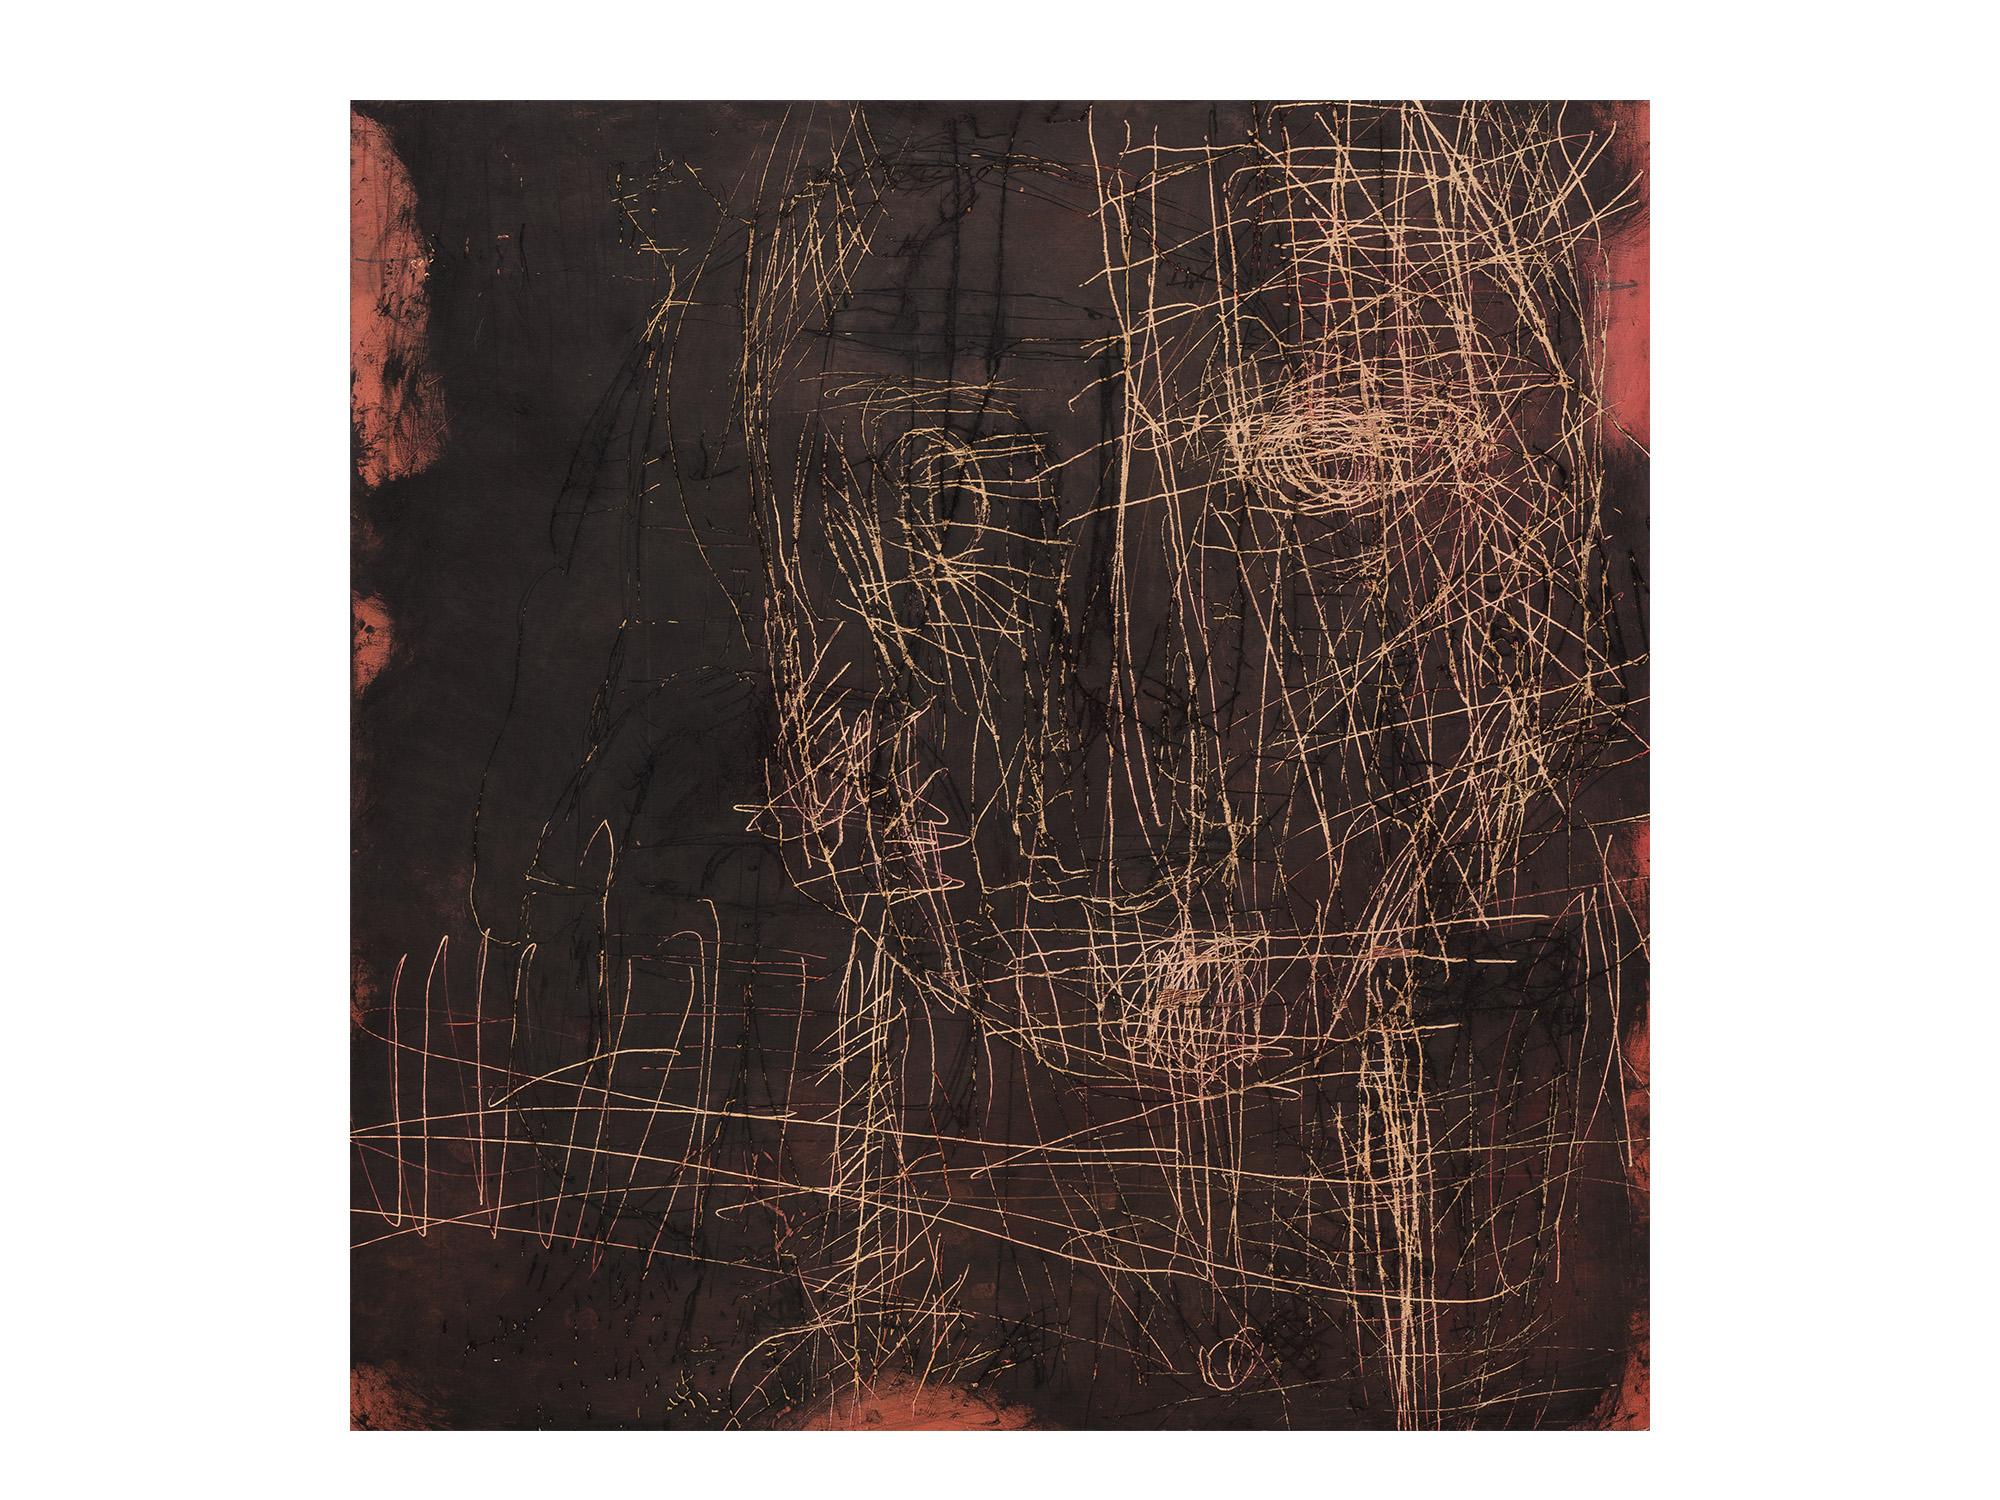 Robert Doble   Manifest , 2018 oil on archival marine ply 20 x 122cm   ARTIST BIO